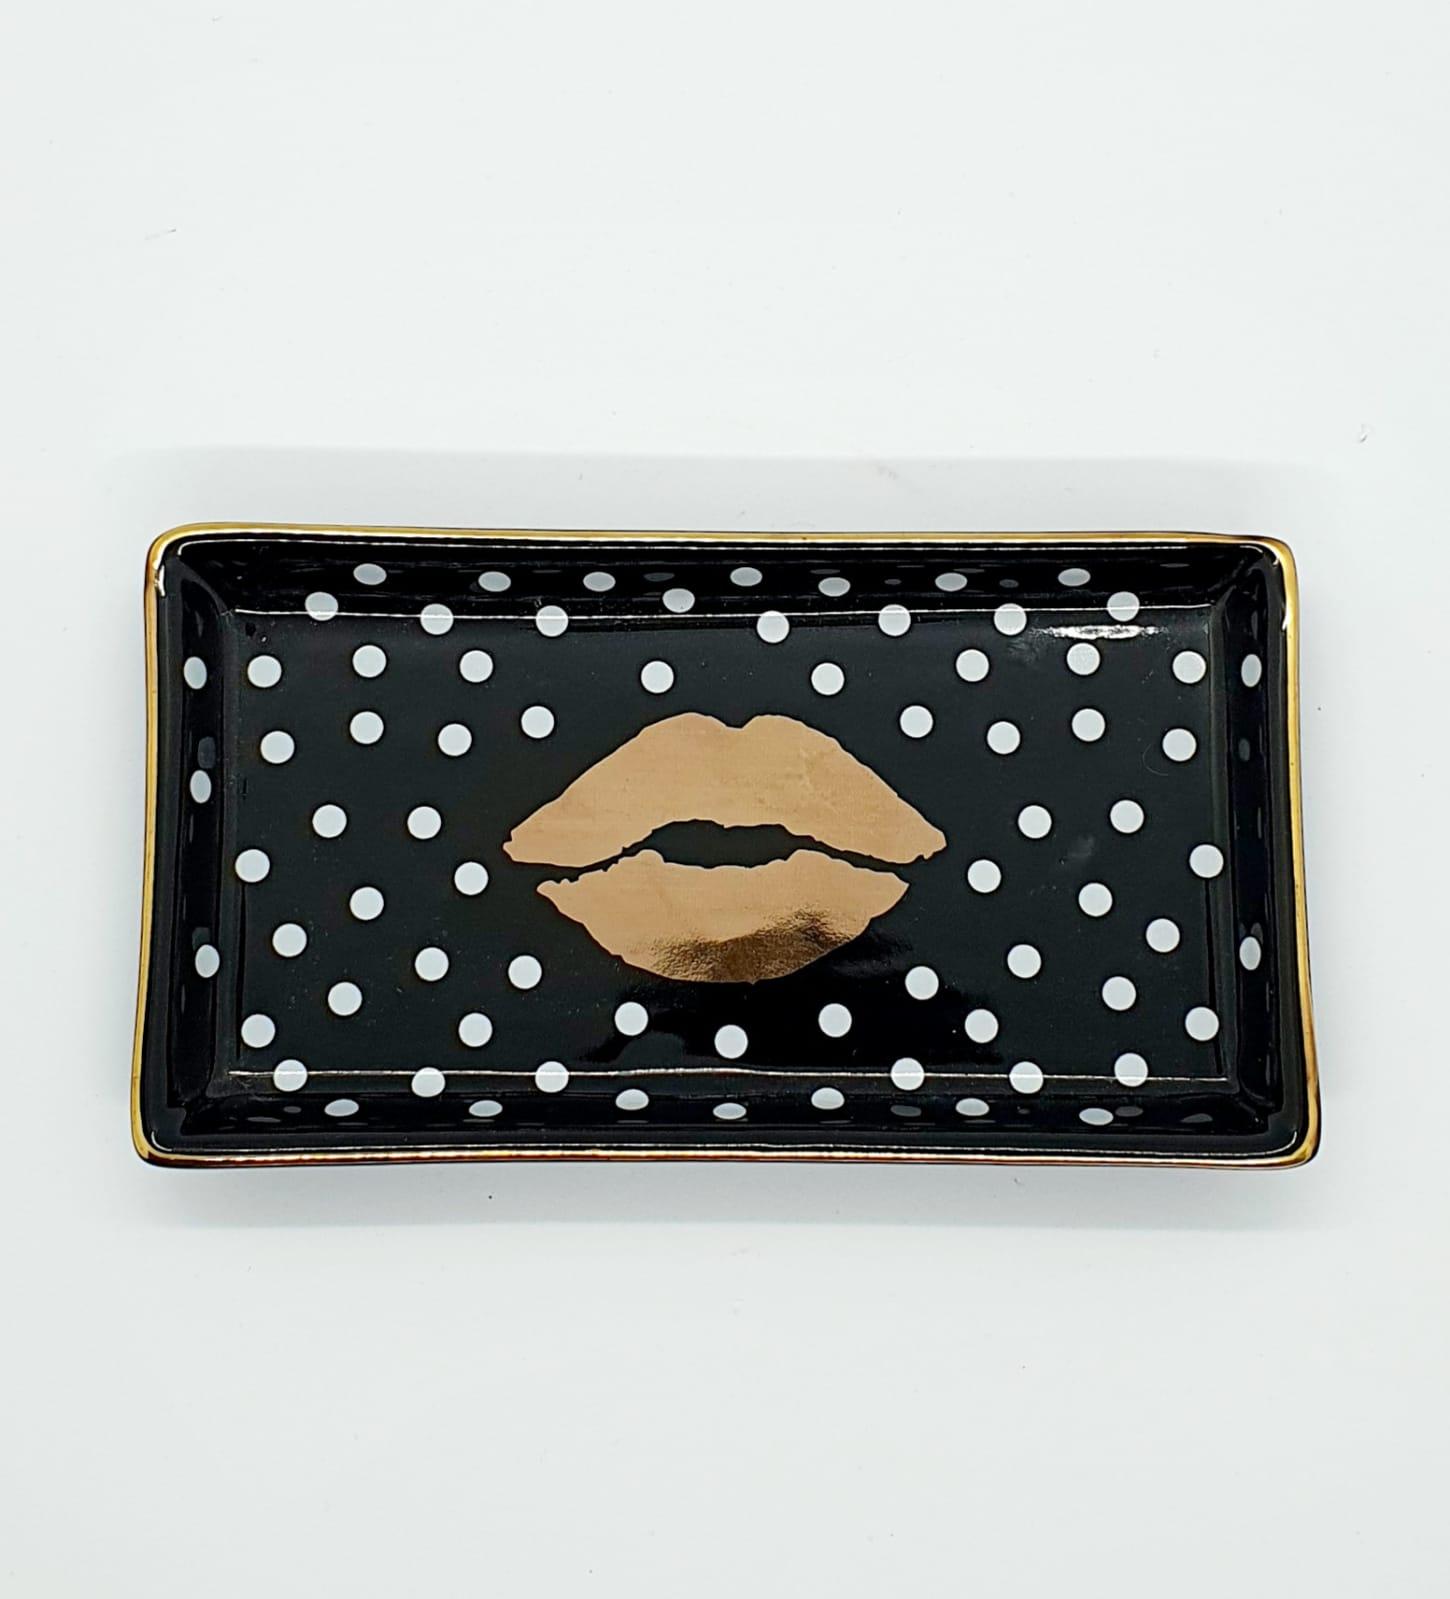 Porta joias retangular beijo em cerâmica